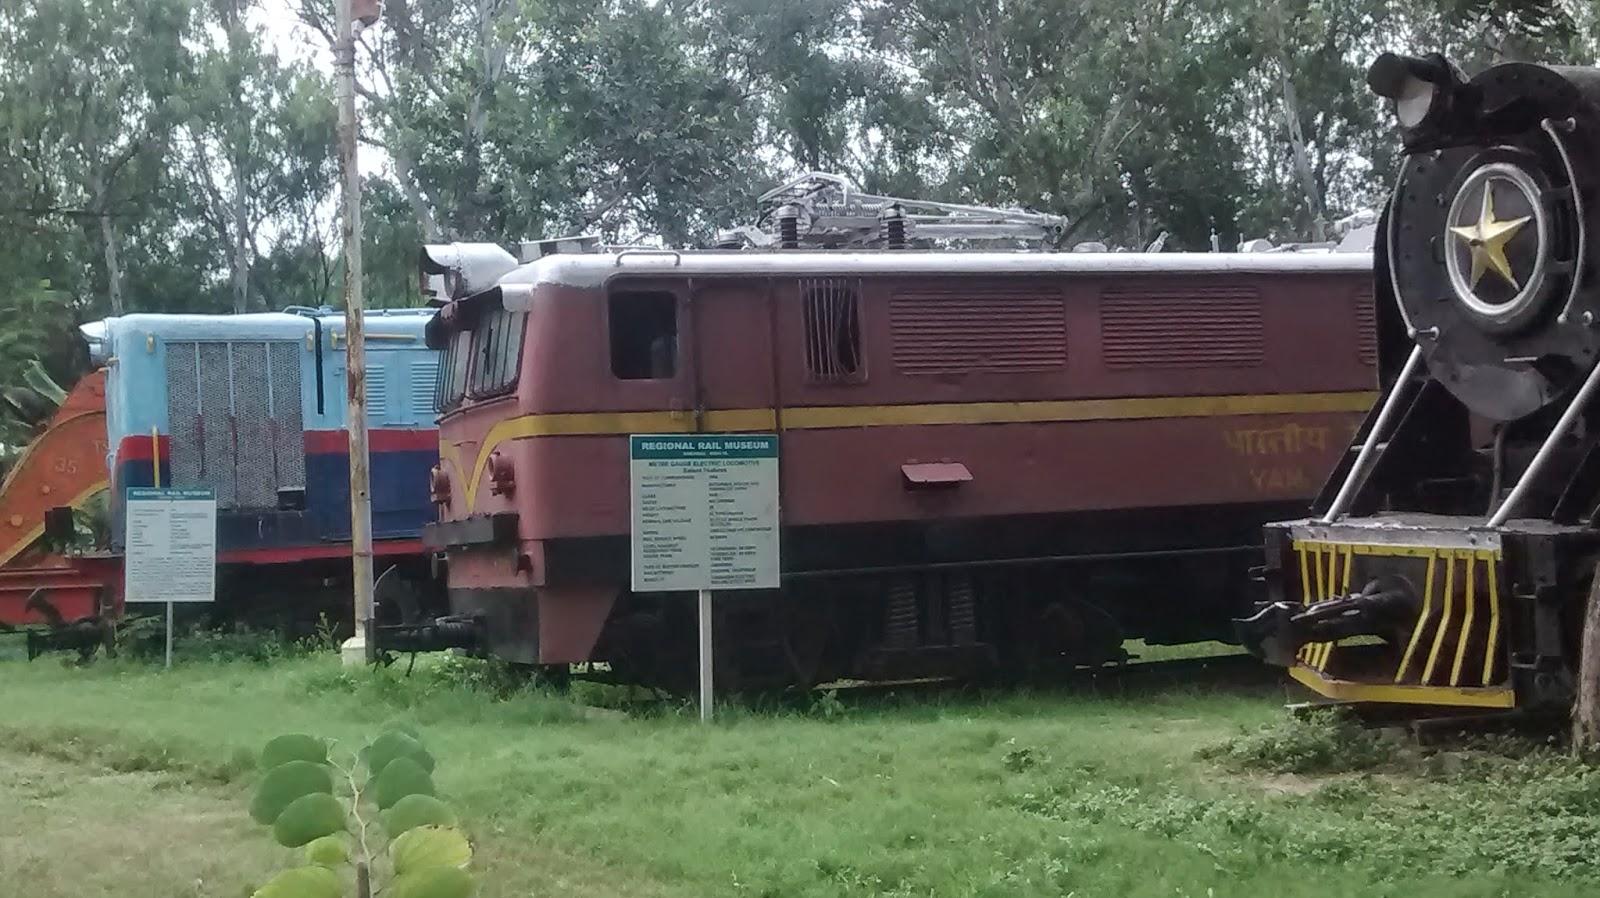 regional railway museum icf chennai train museum photos